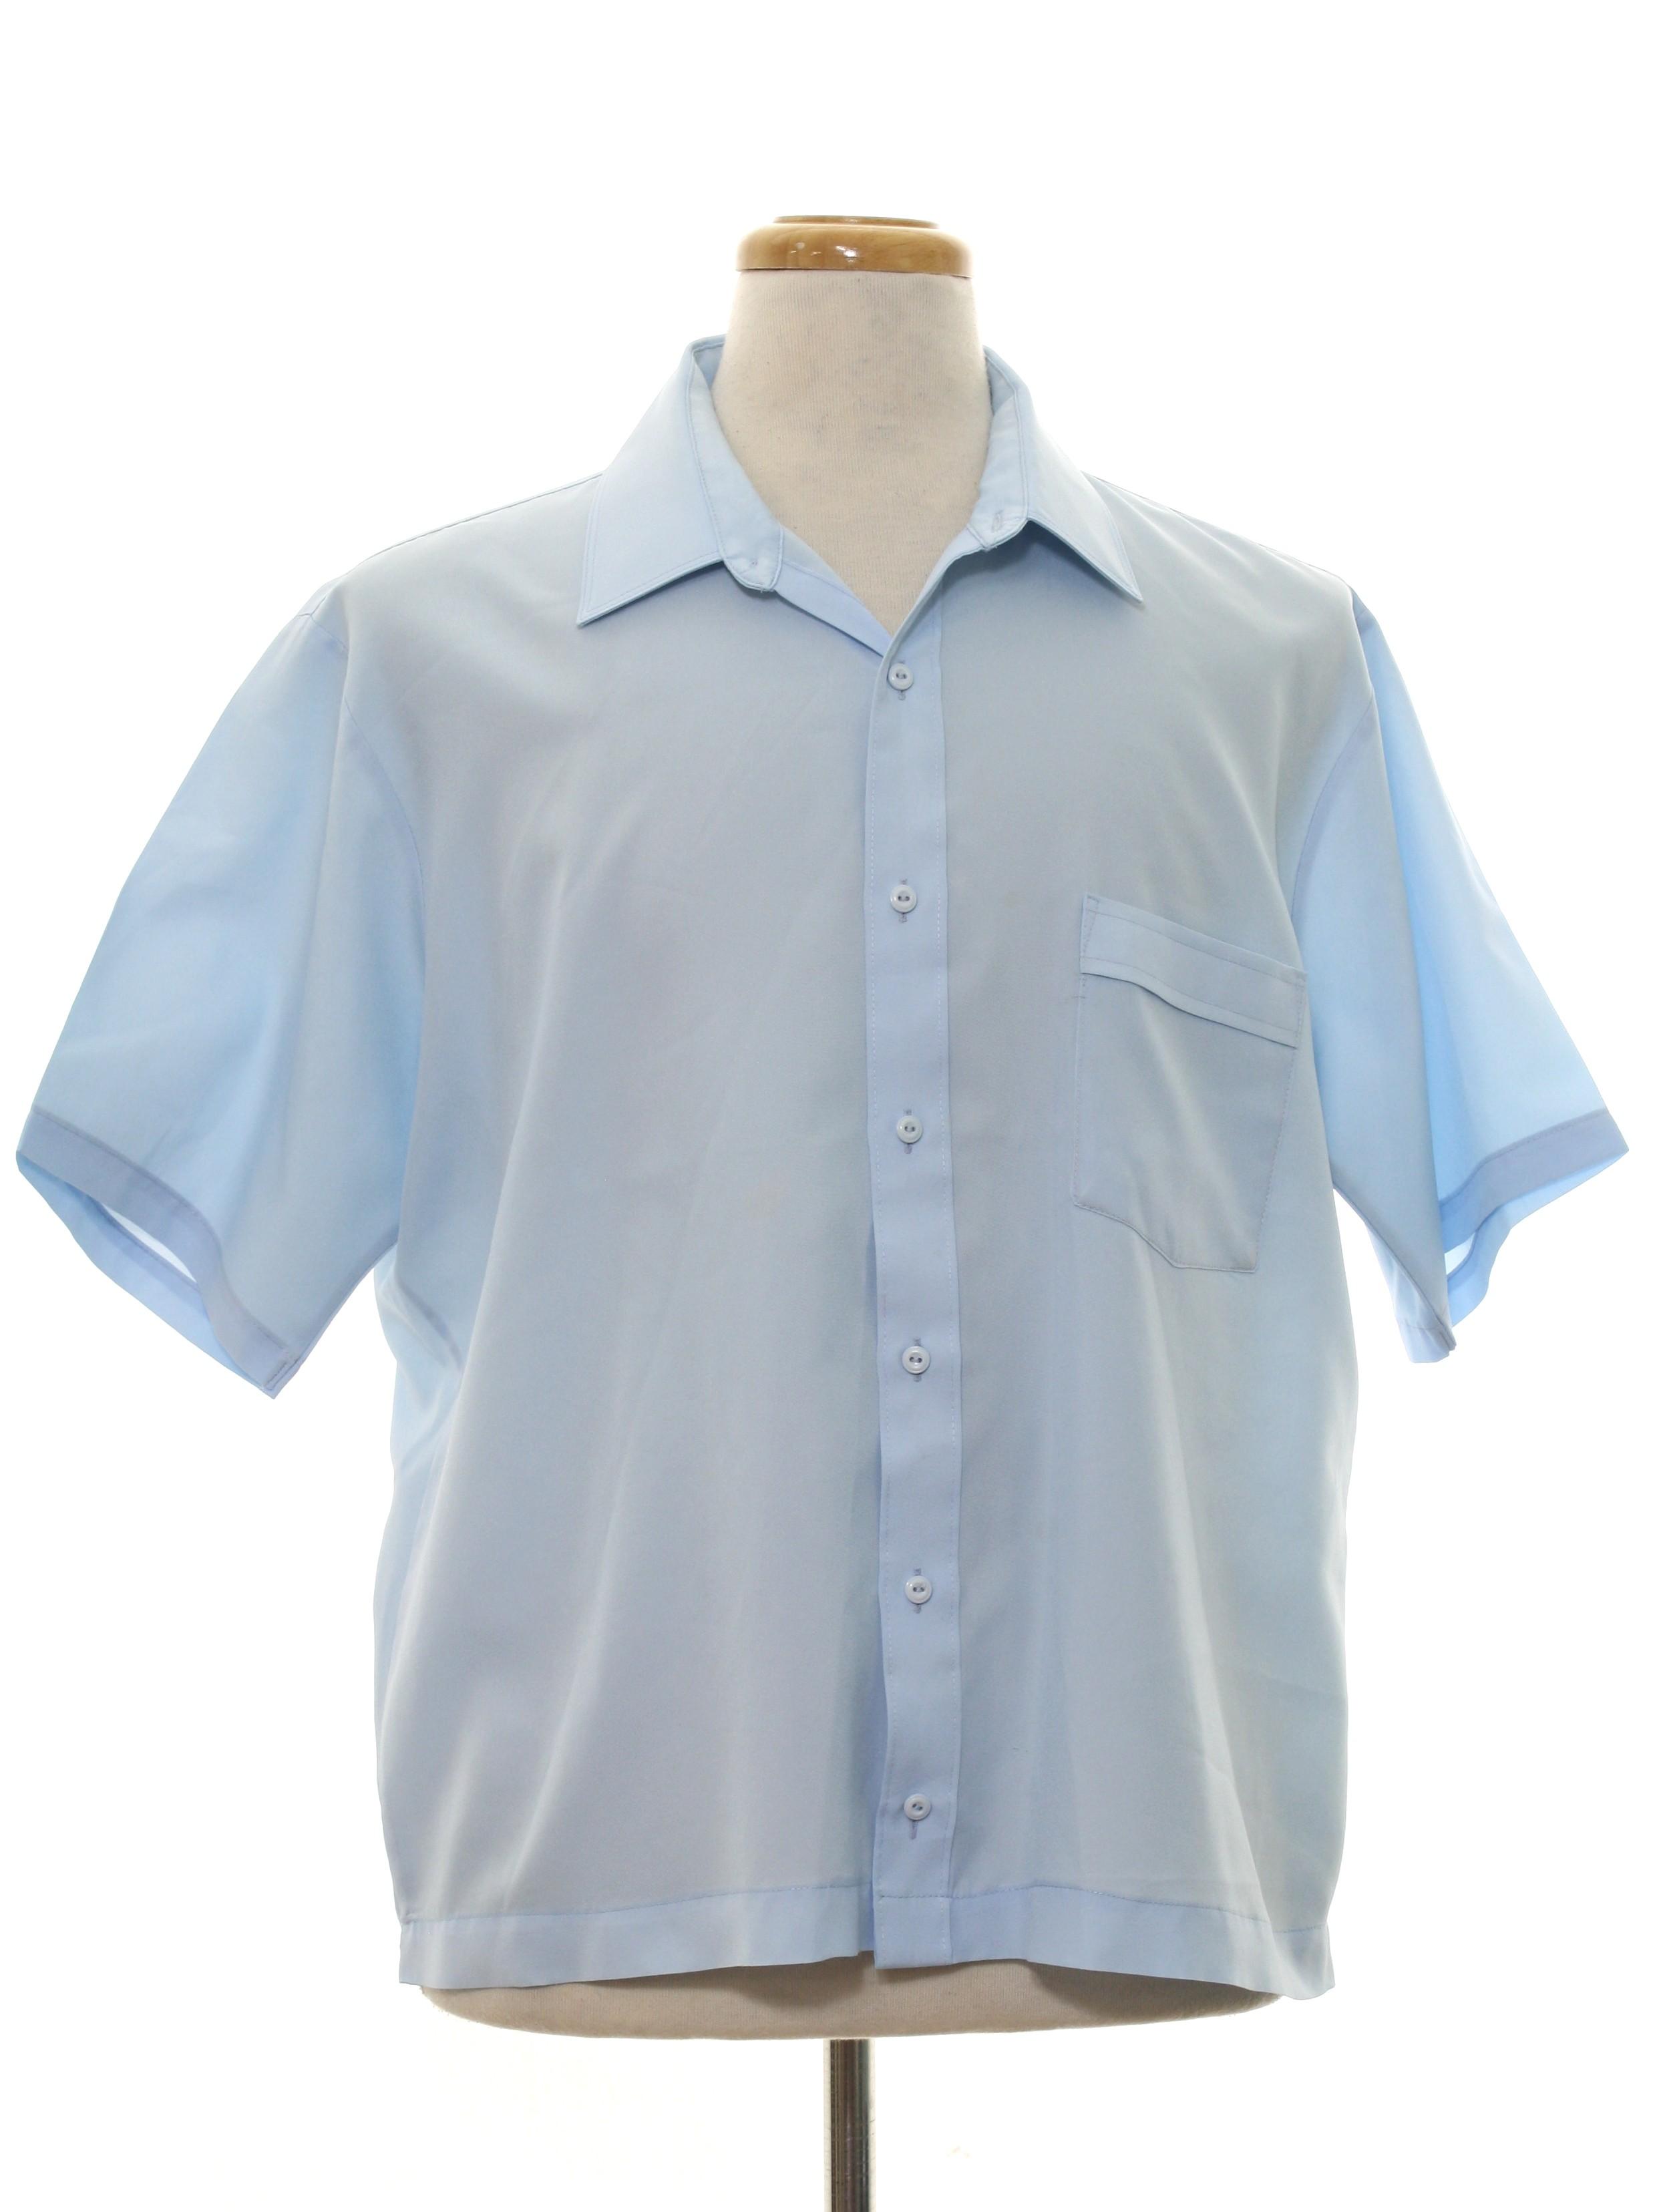 Jc penney lustre silk seventies vintage shirt 70s jc for Sports shirts near me